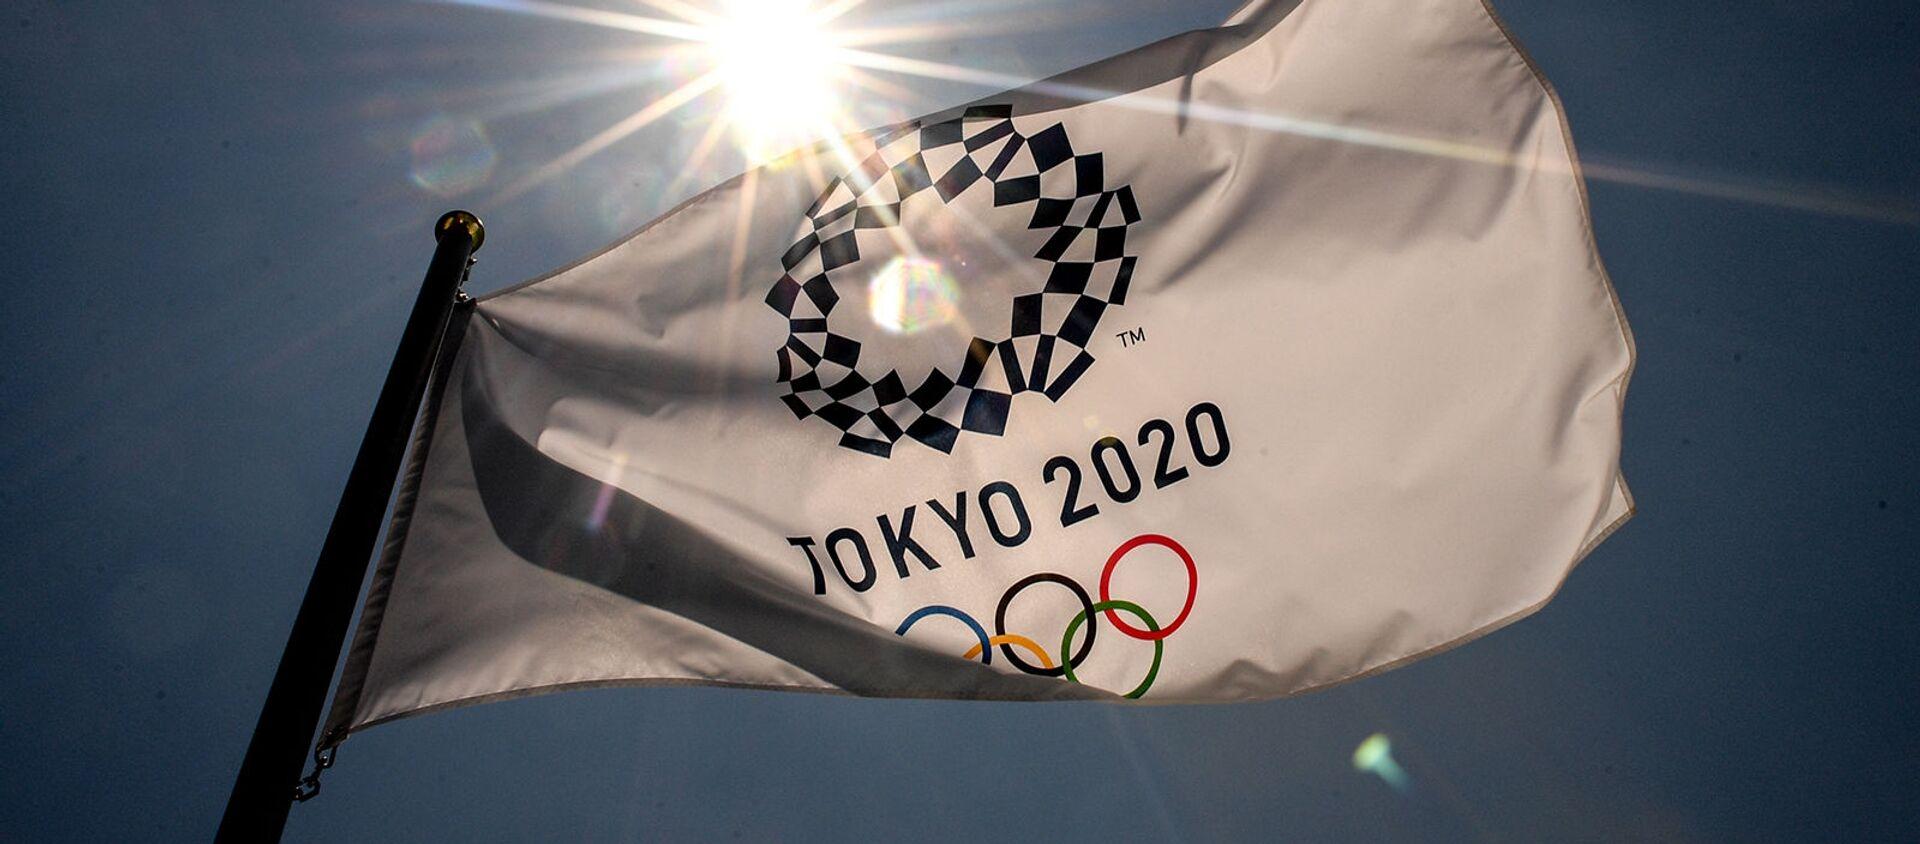 Флаг с символикой Олимпийских игр в Aomi Urban Sports Park в Токио - Sputnik Արմենիա, 1920, 22.07.2021